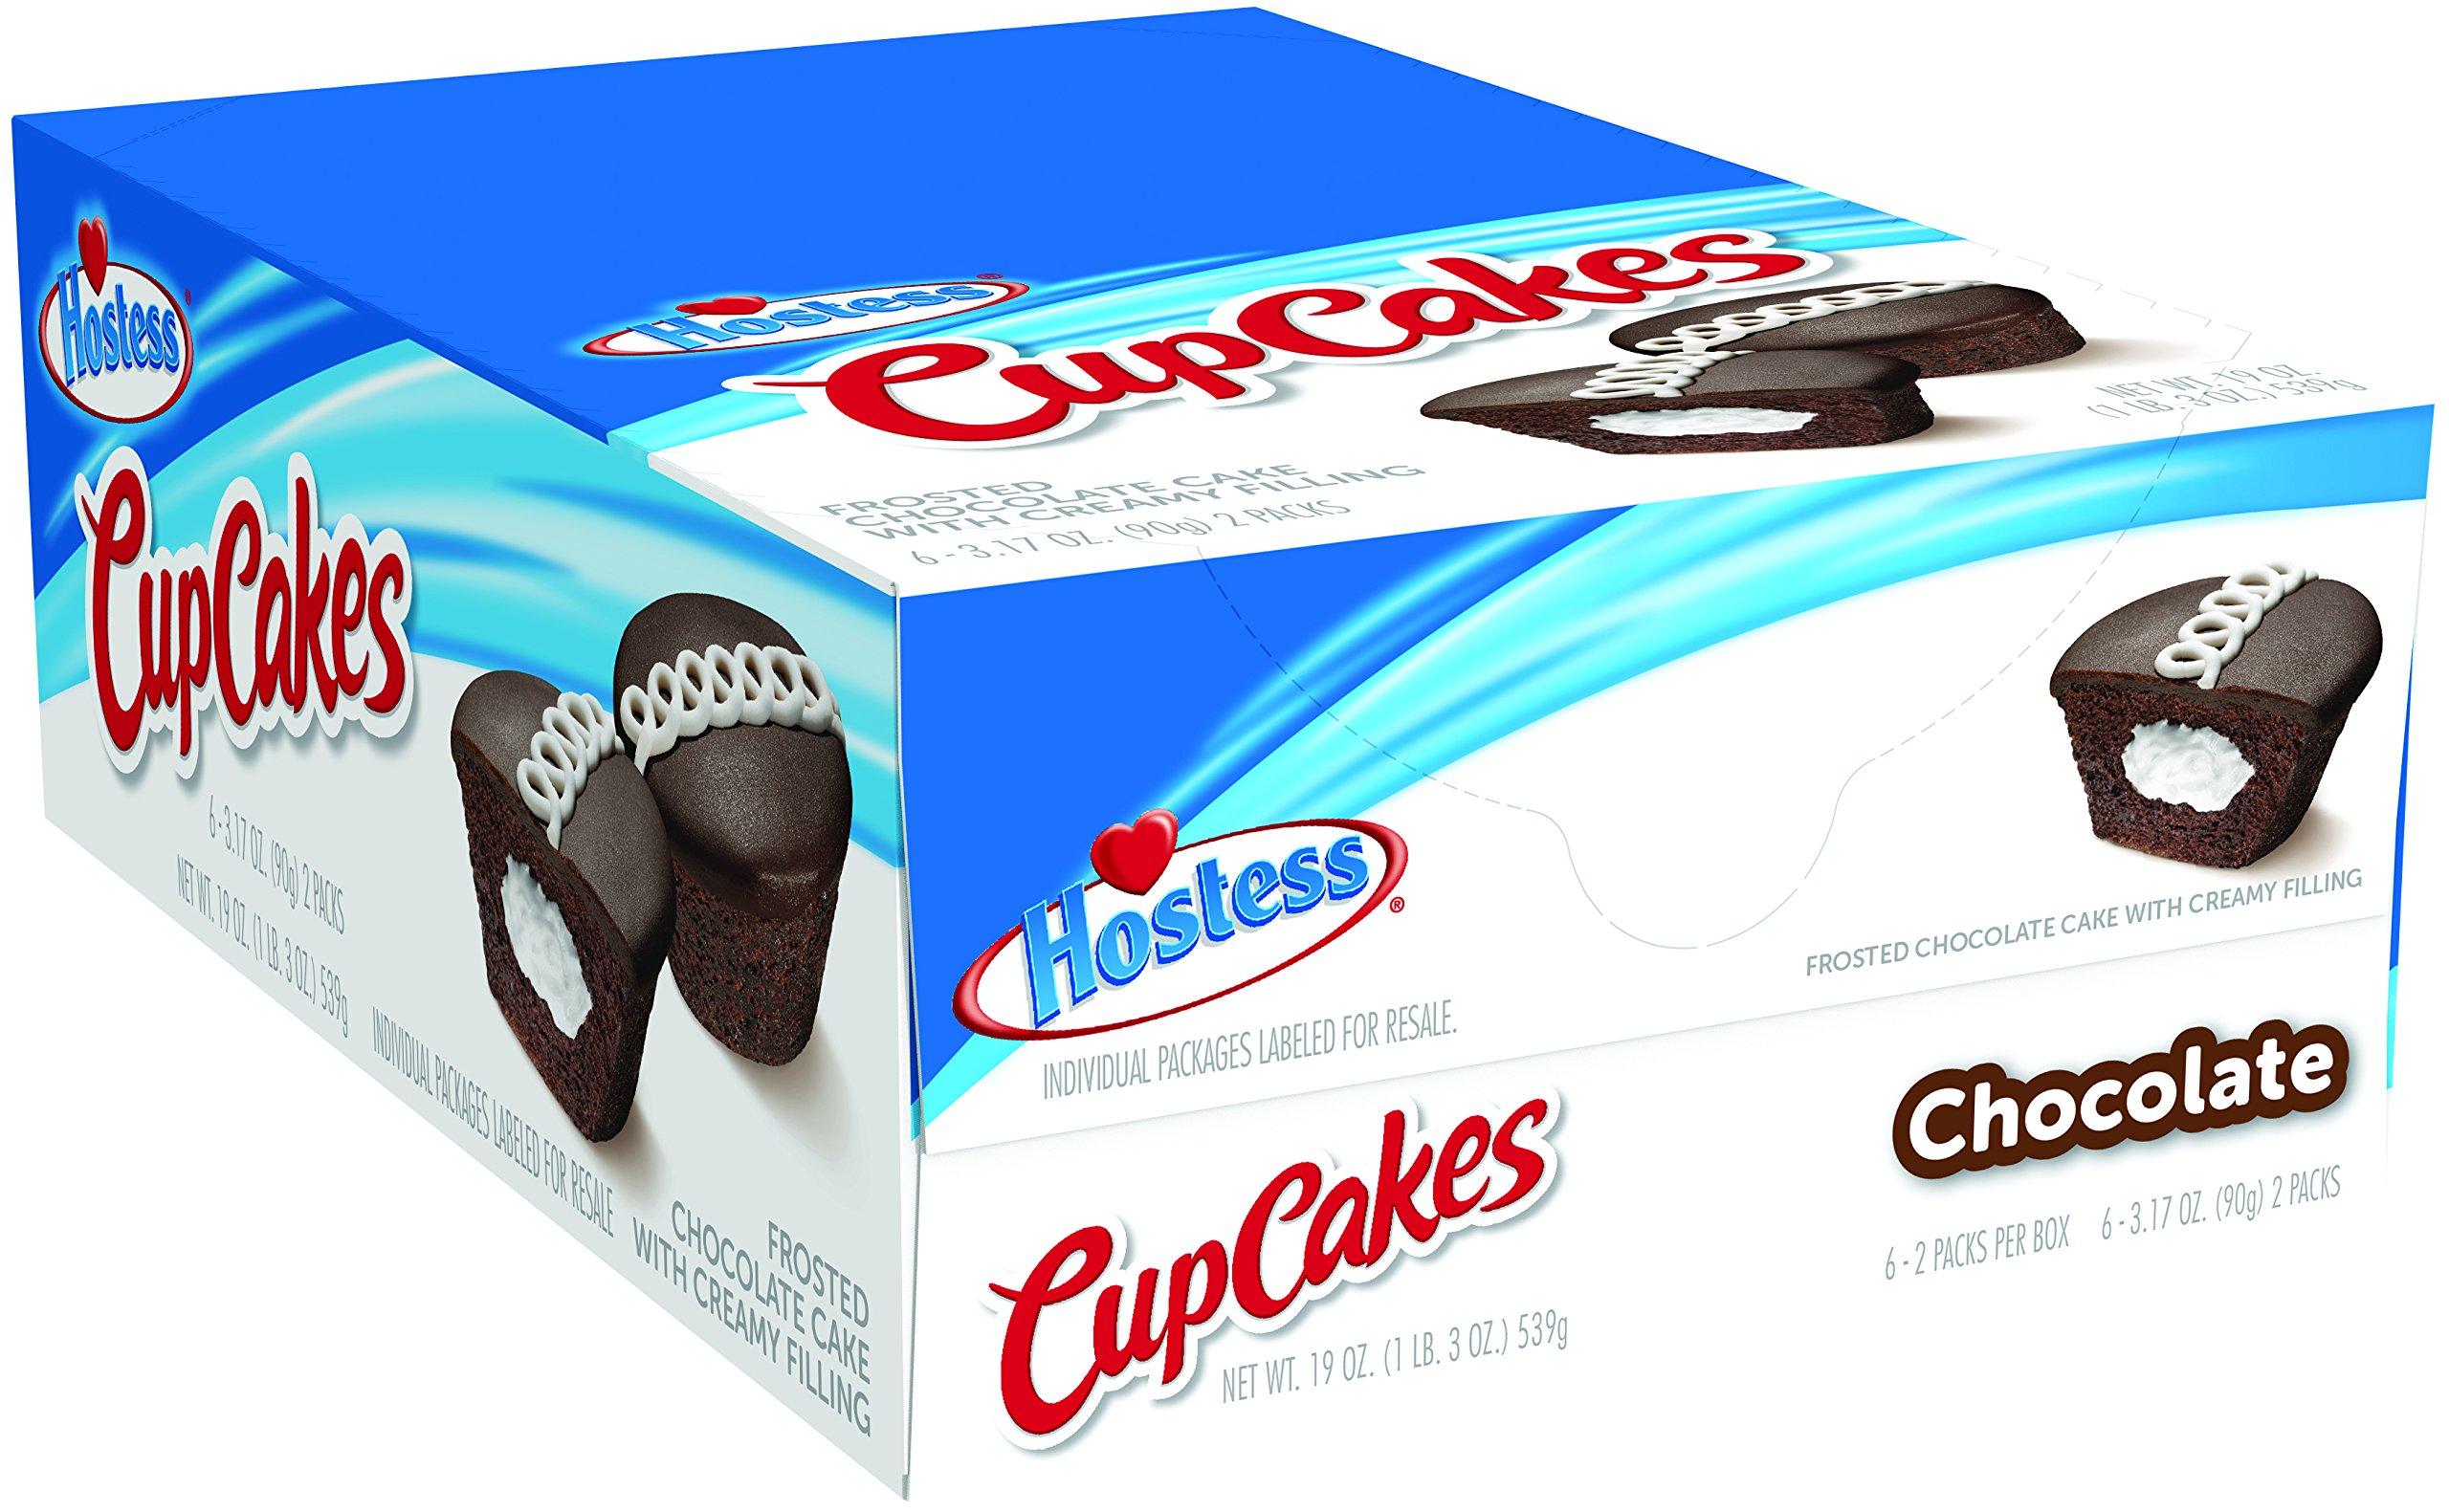 Hostess Cupcakes, Chocolate, 3.17 Ounce, 6 Count